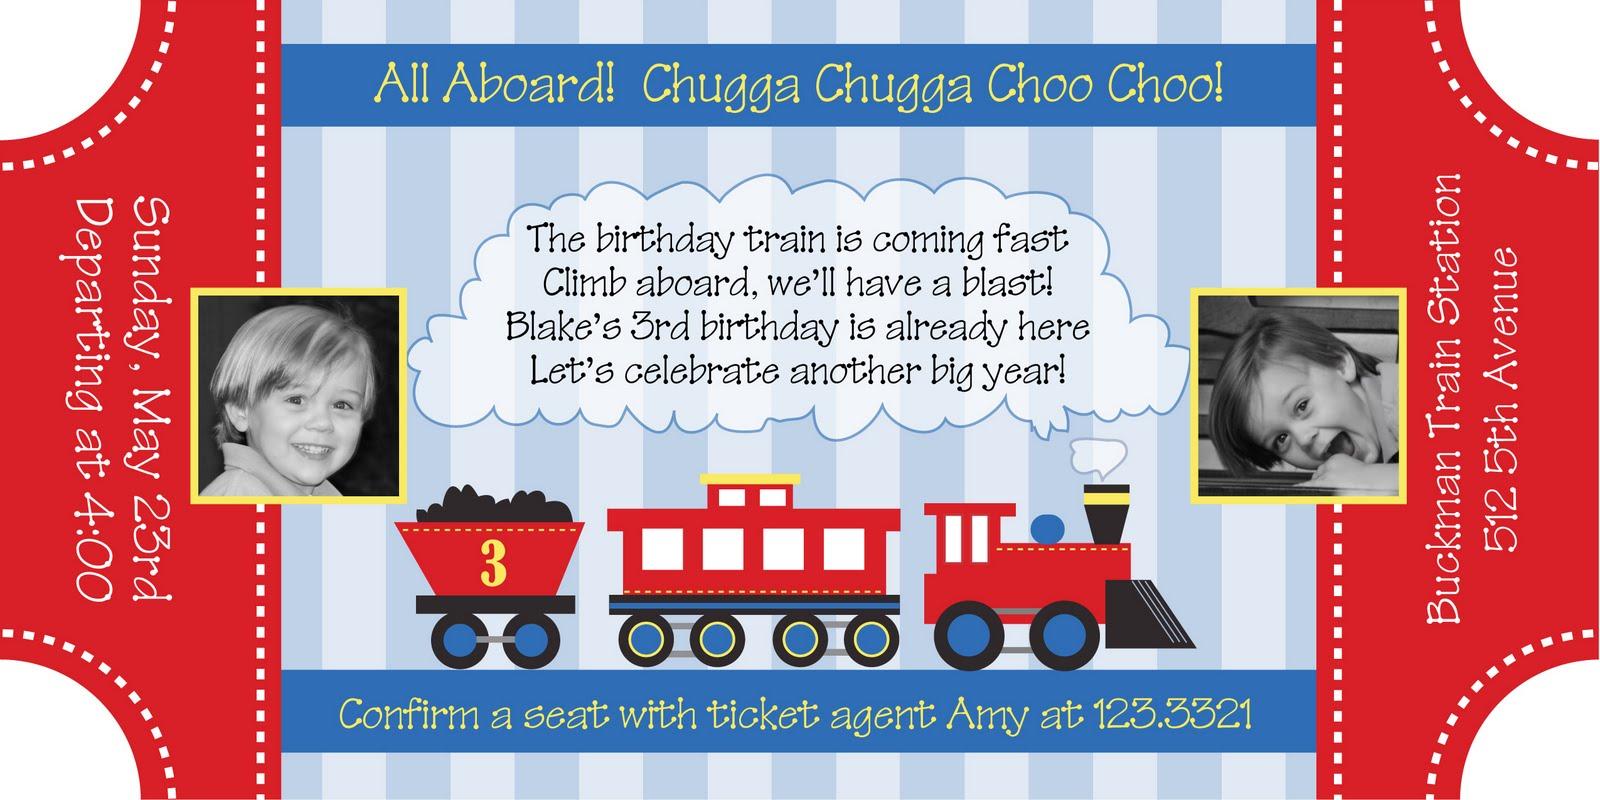 All Aboard the Choo Choo Train Party Anders Ruff Custom Designs LLC